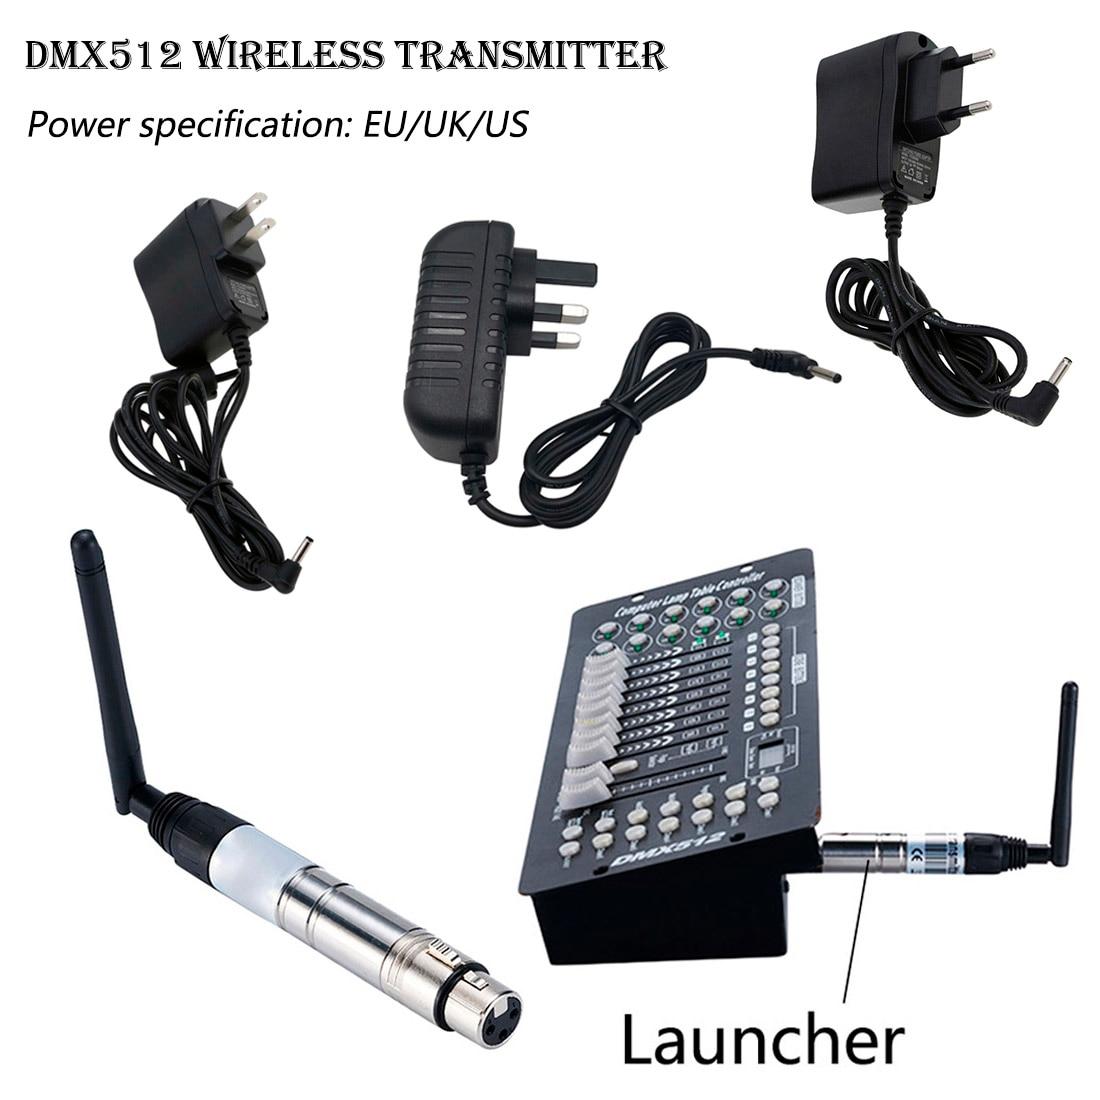 1 Set DMX512 DJ Wireless System Transmitter 2.4G For LED Stage Light LED Light 500m Control